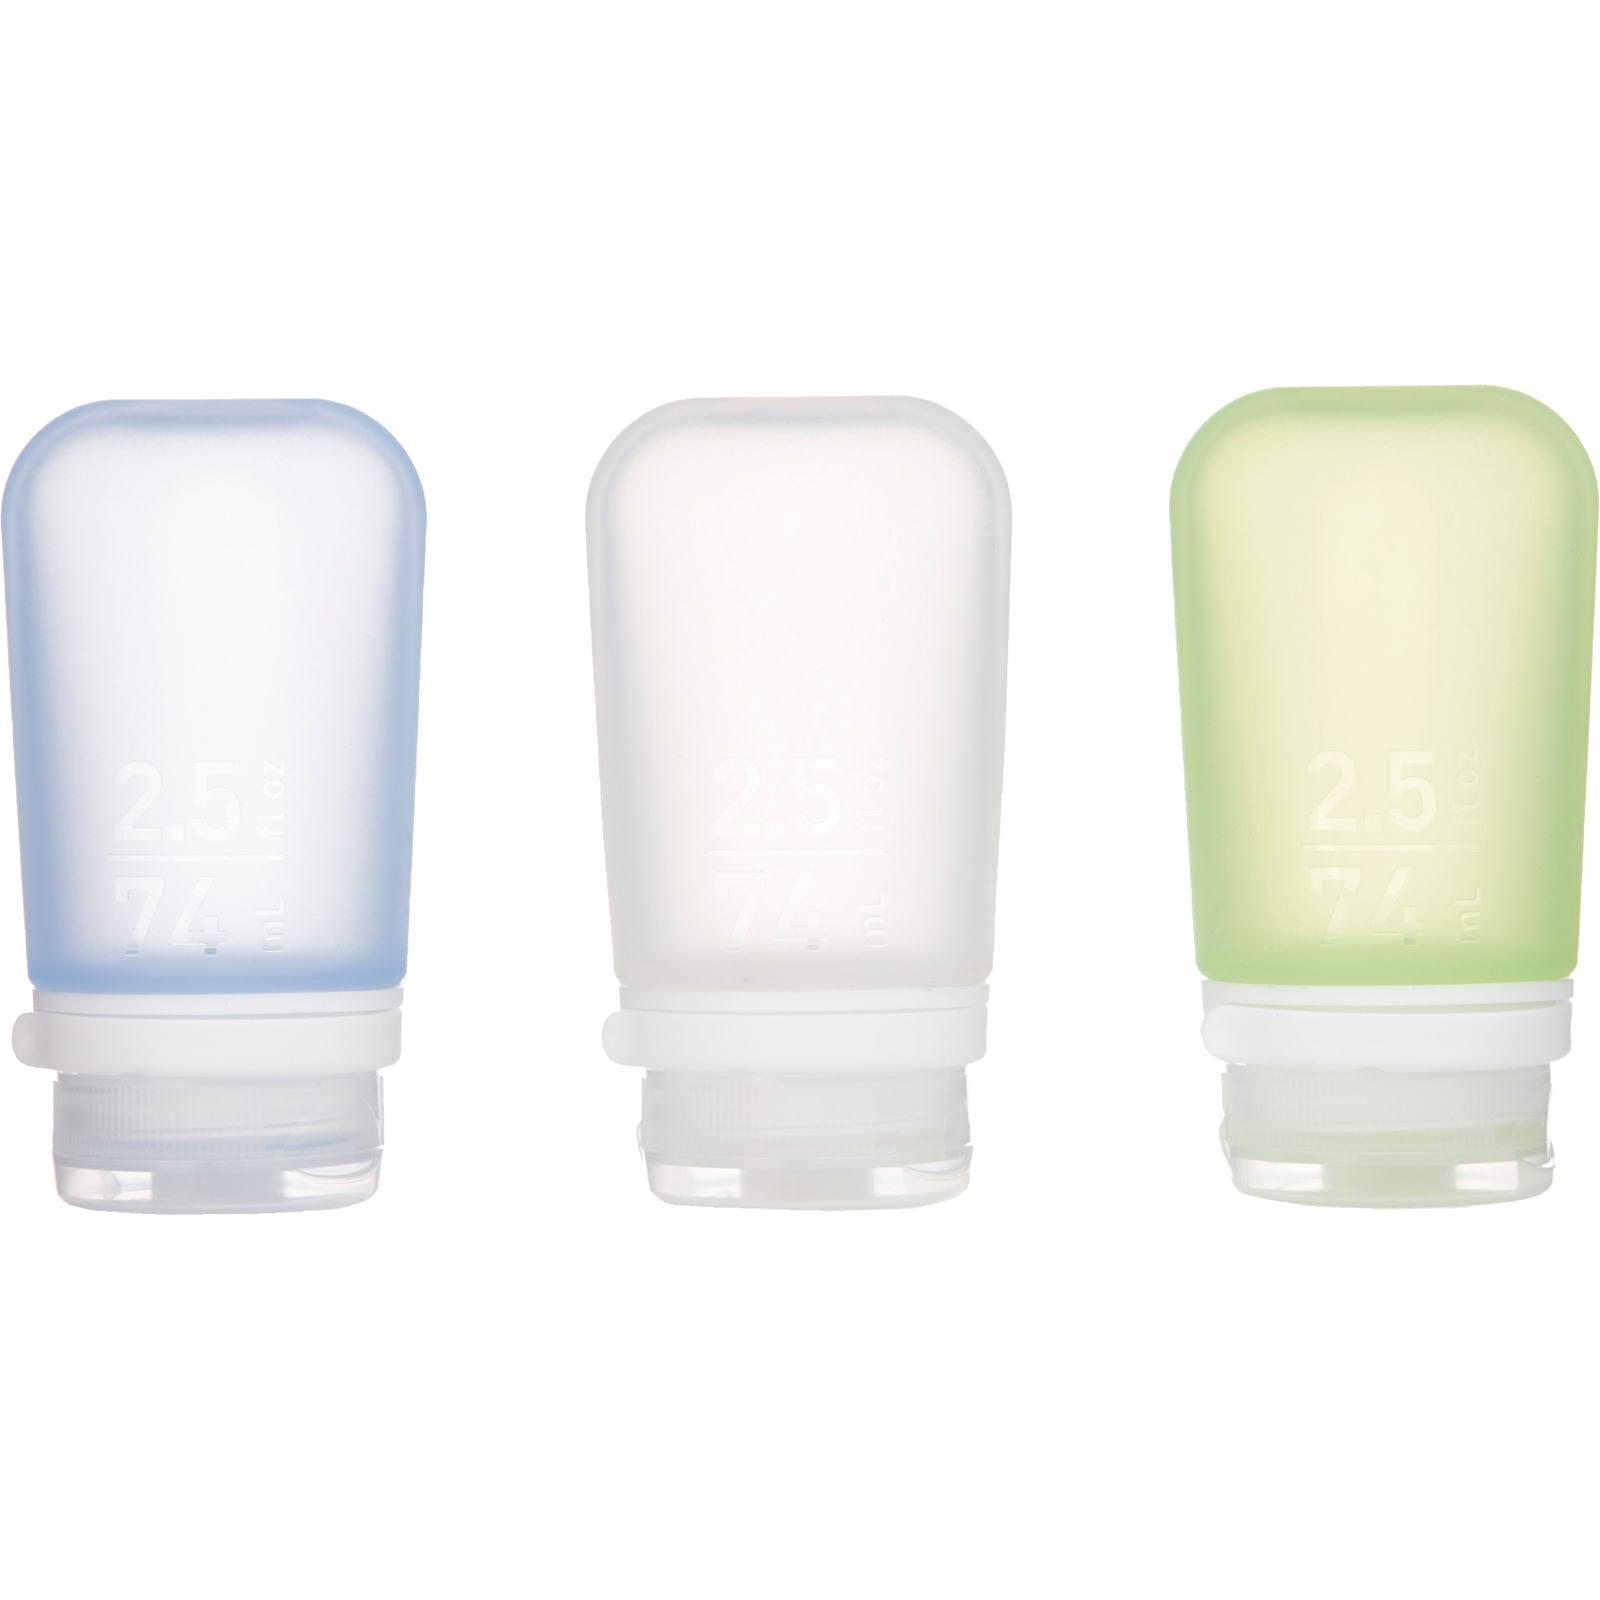 humangear GoToob 3er Pack - 3 x 74 ml Tube transparent-grün-blau - Bild 3